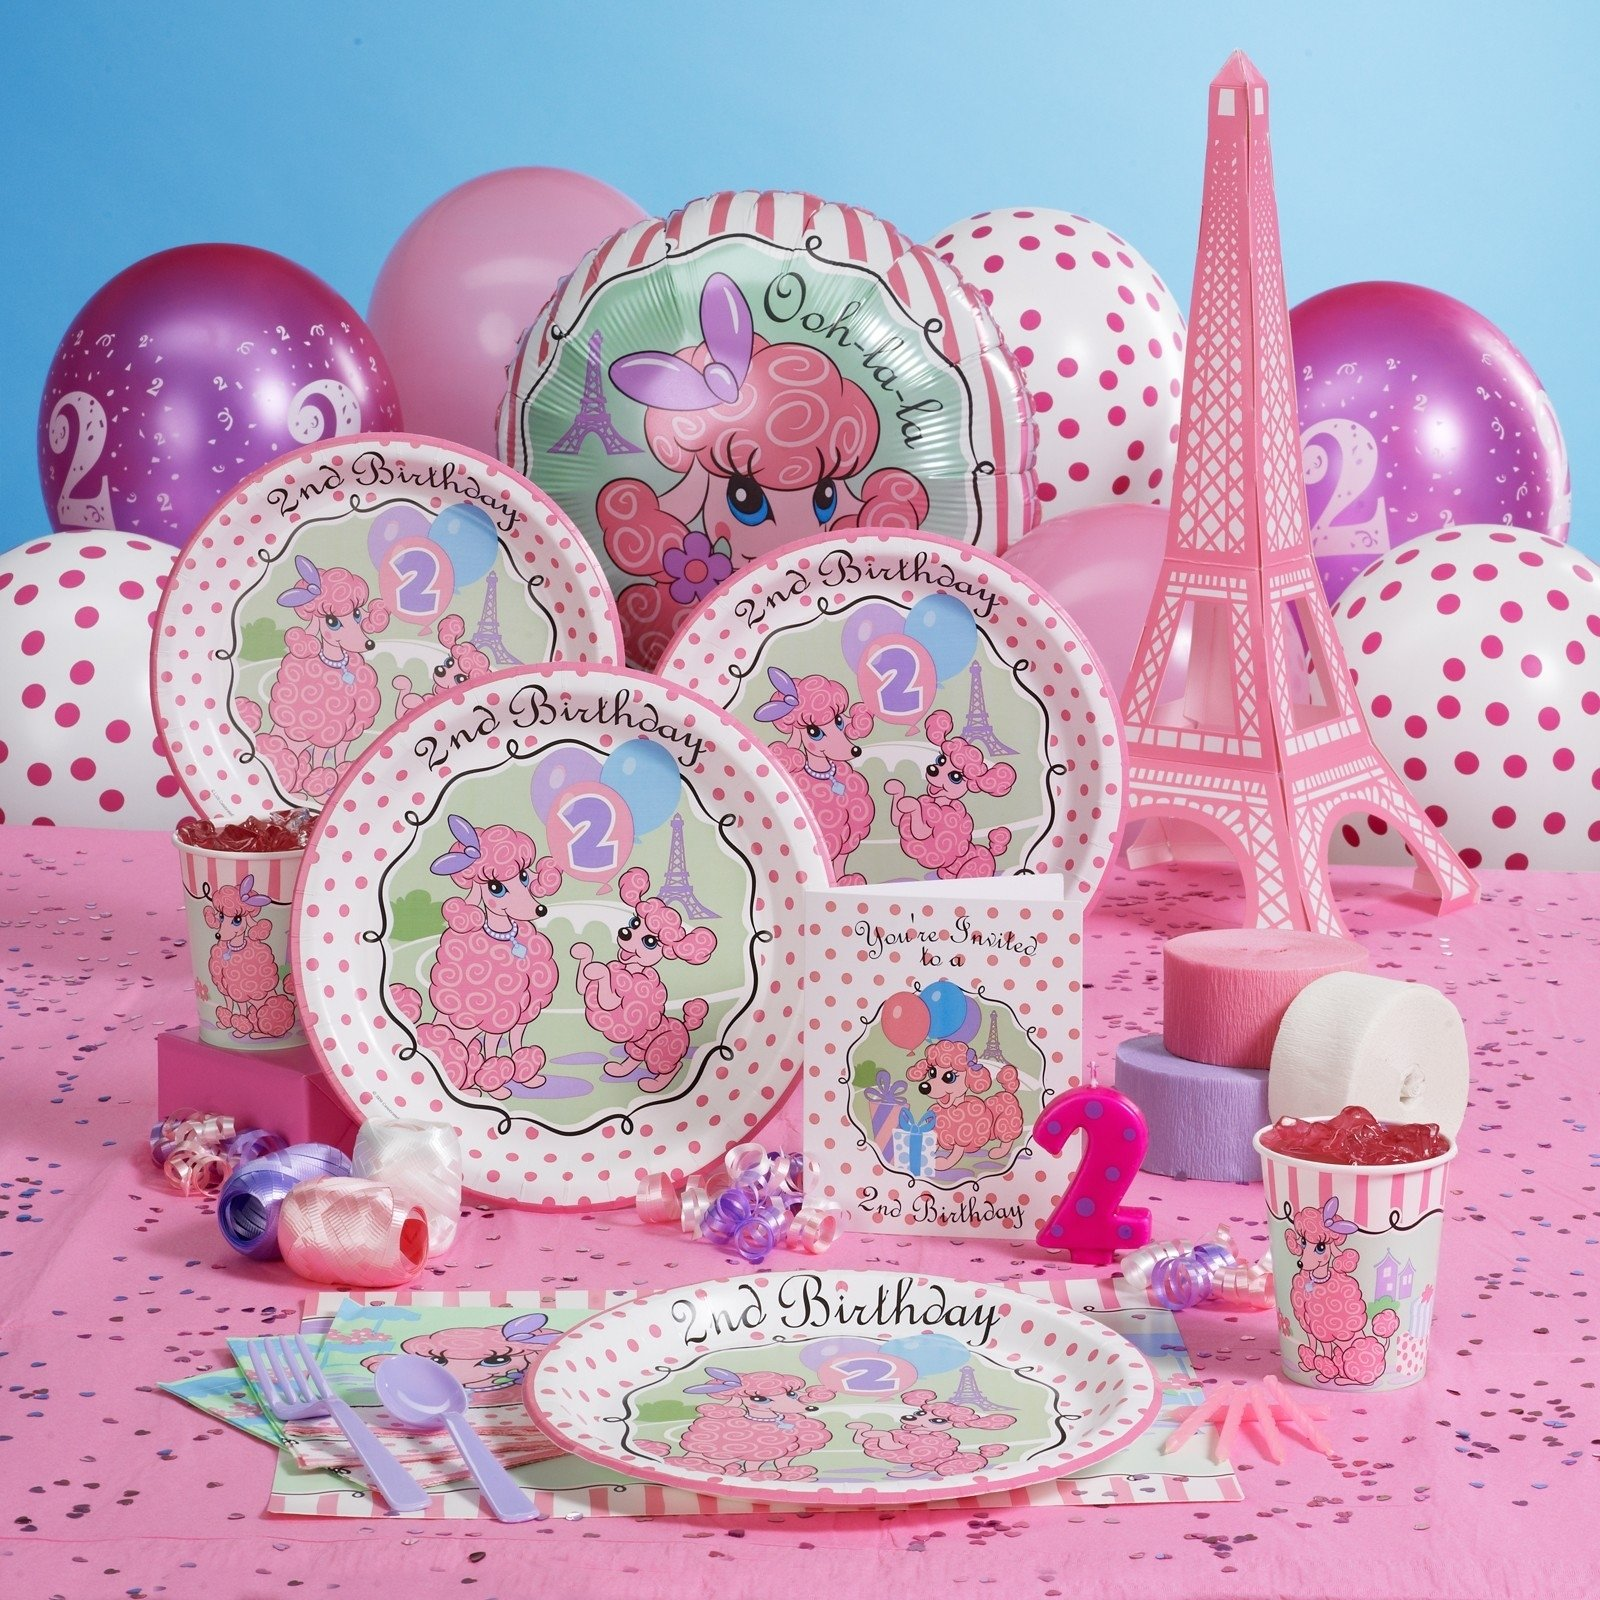 10 Stylish 2Nd Birthday Party Ideas Girl littlegirlbirthdaypartyideas unexpectedly expecting baby 3 2020